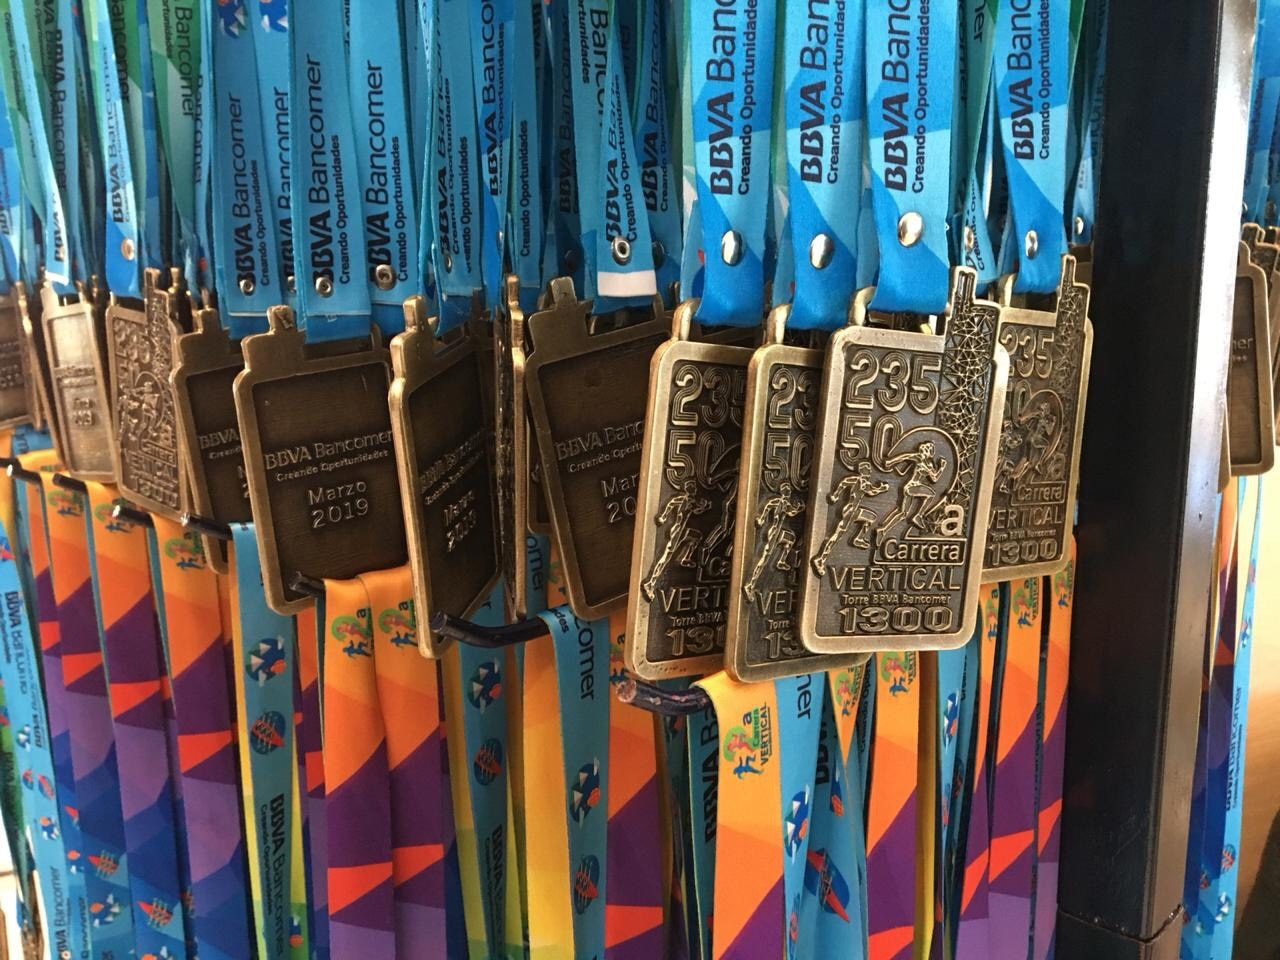 Medallas Segunda Carrera Vertical BBVA Bancomer